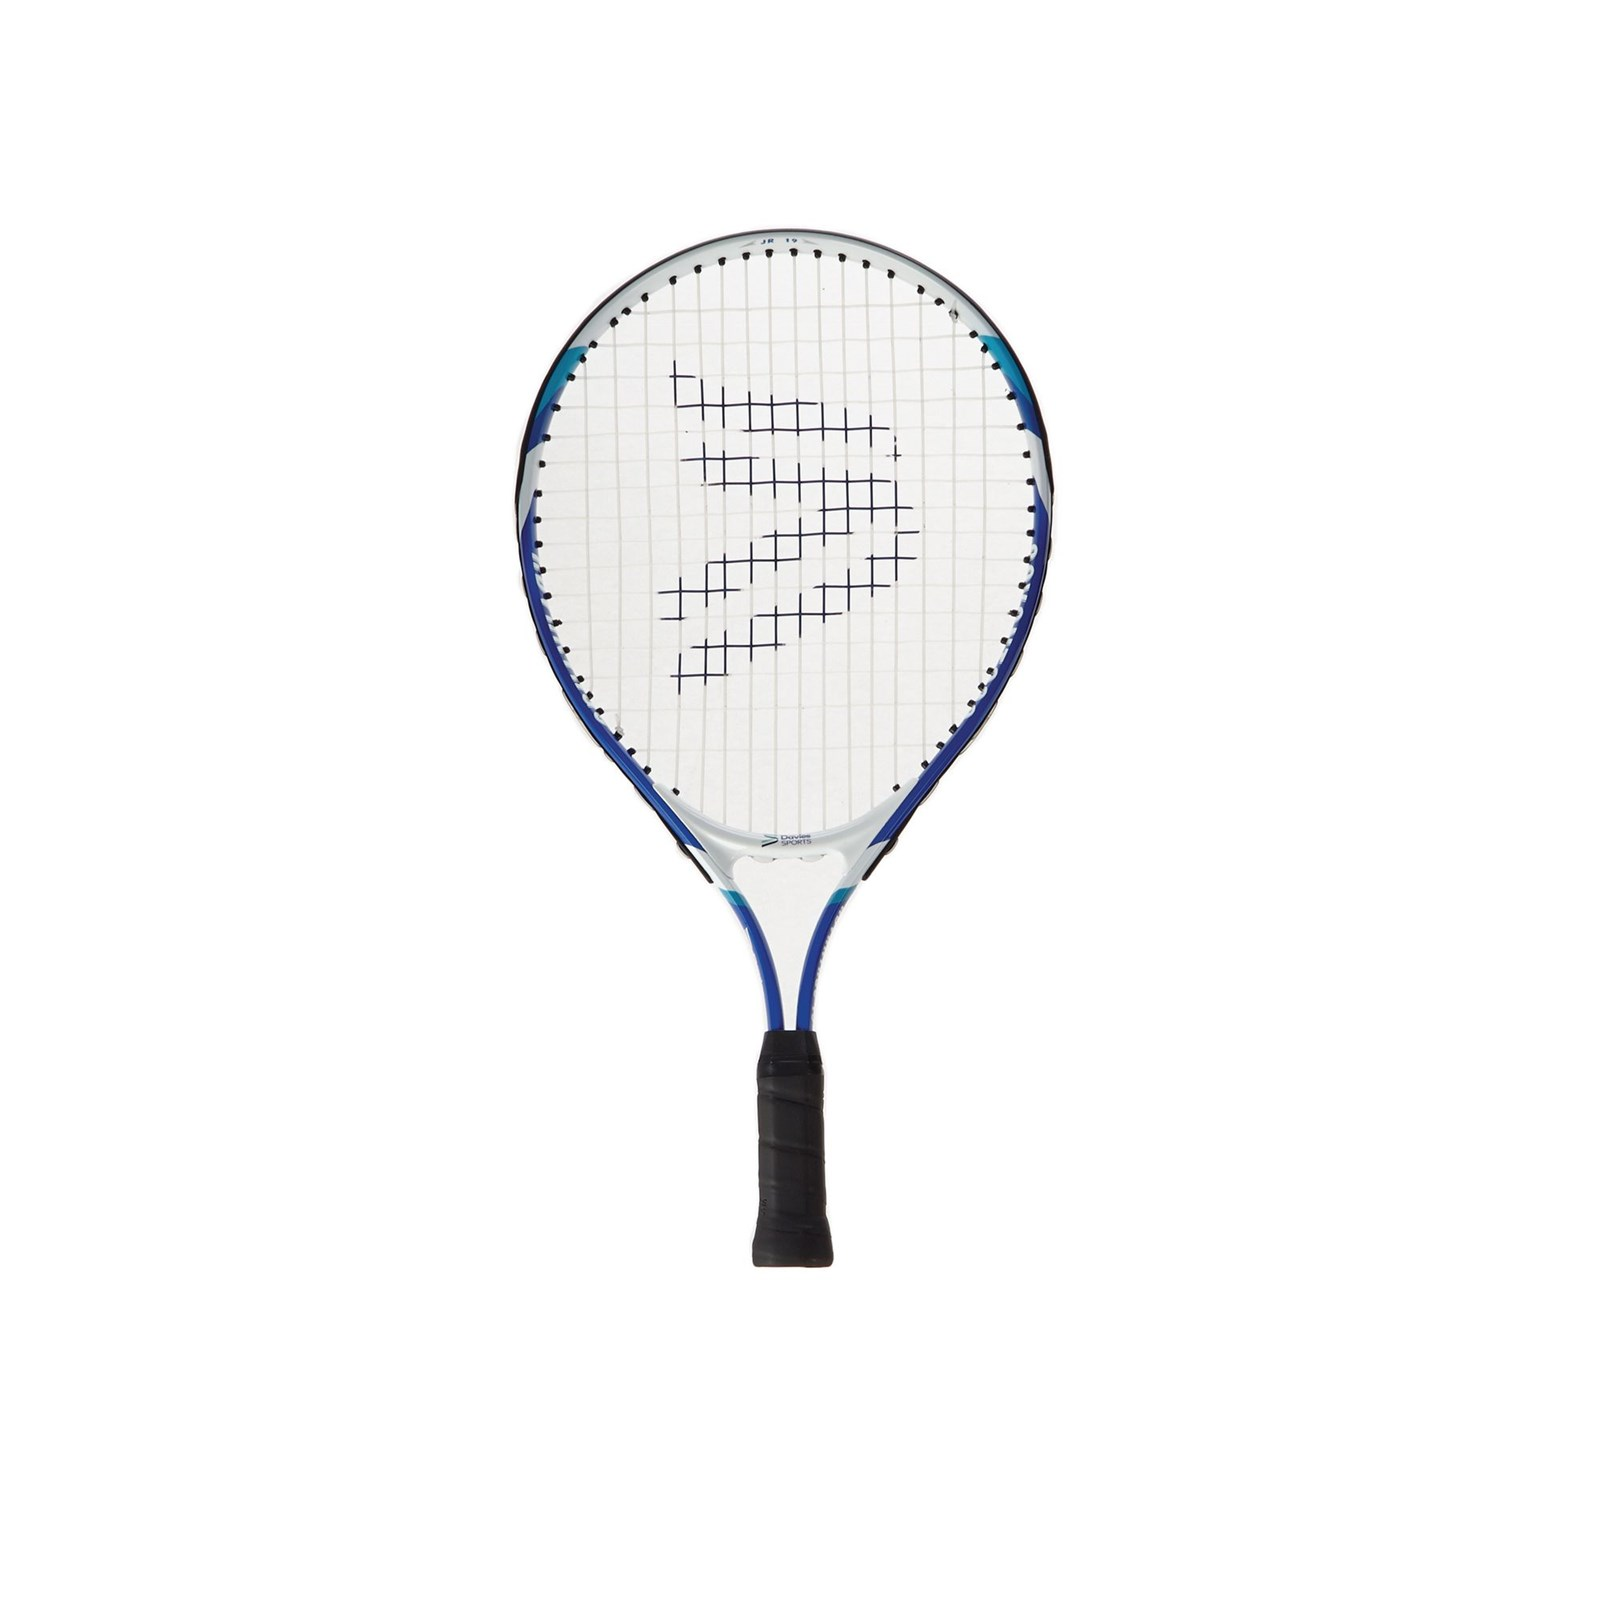 Davies Sports 19in Advantage Racquet